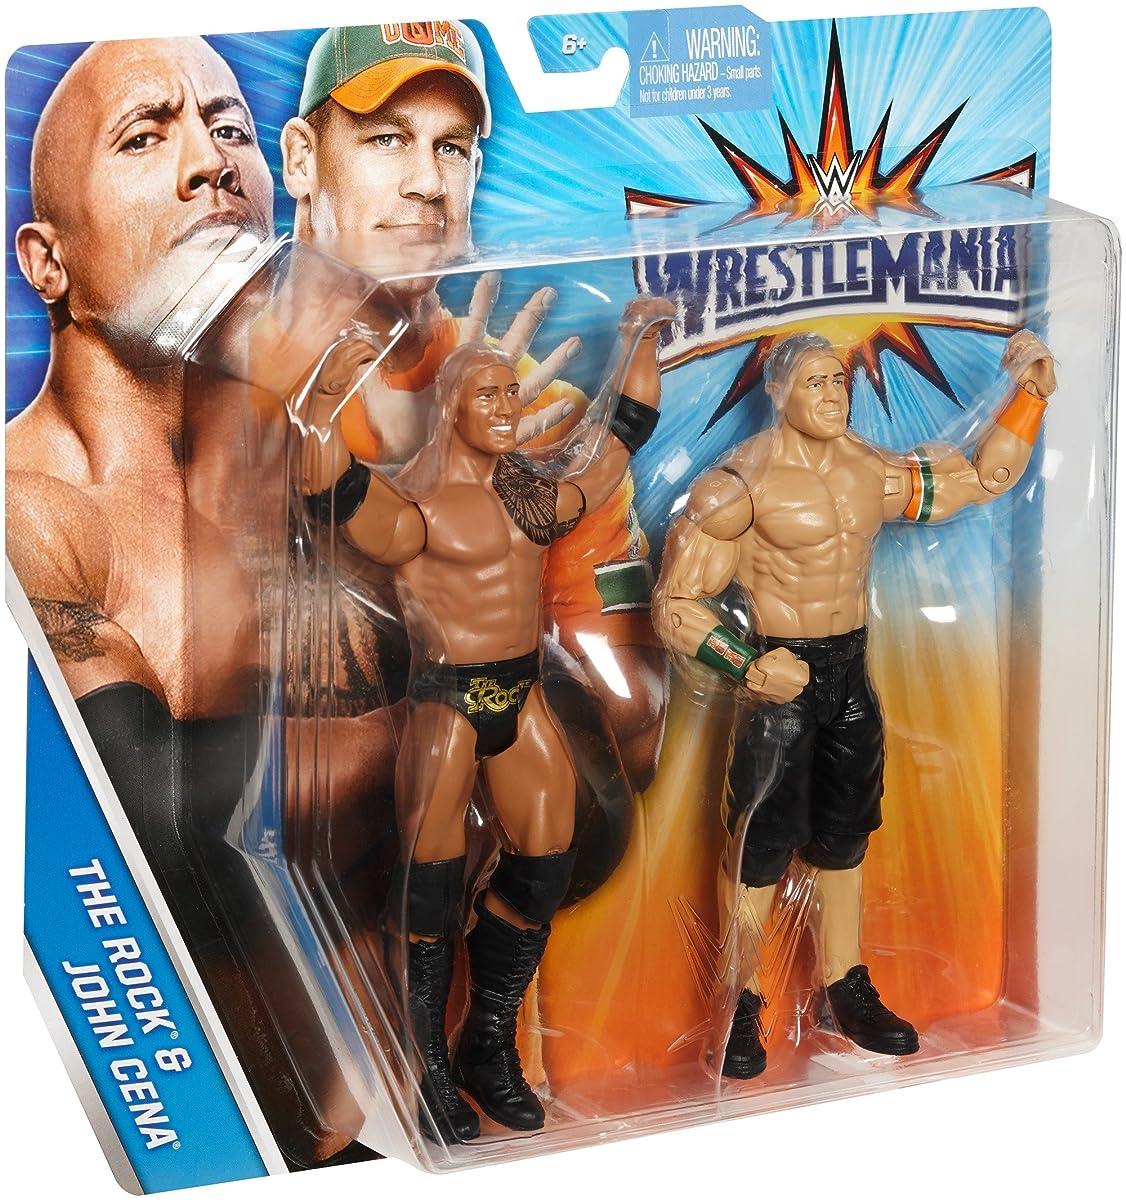 WWE WrestleMania The Rock & John Cena Figures, 2 Pack